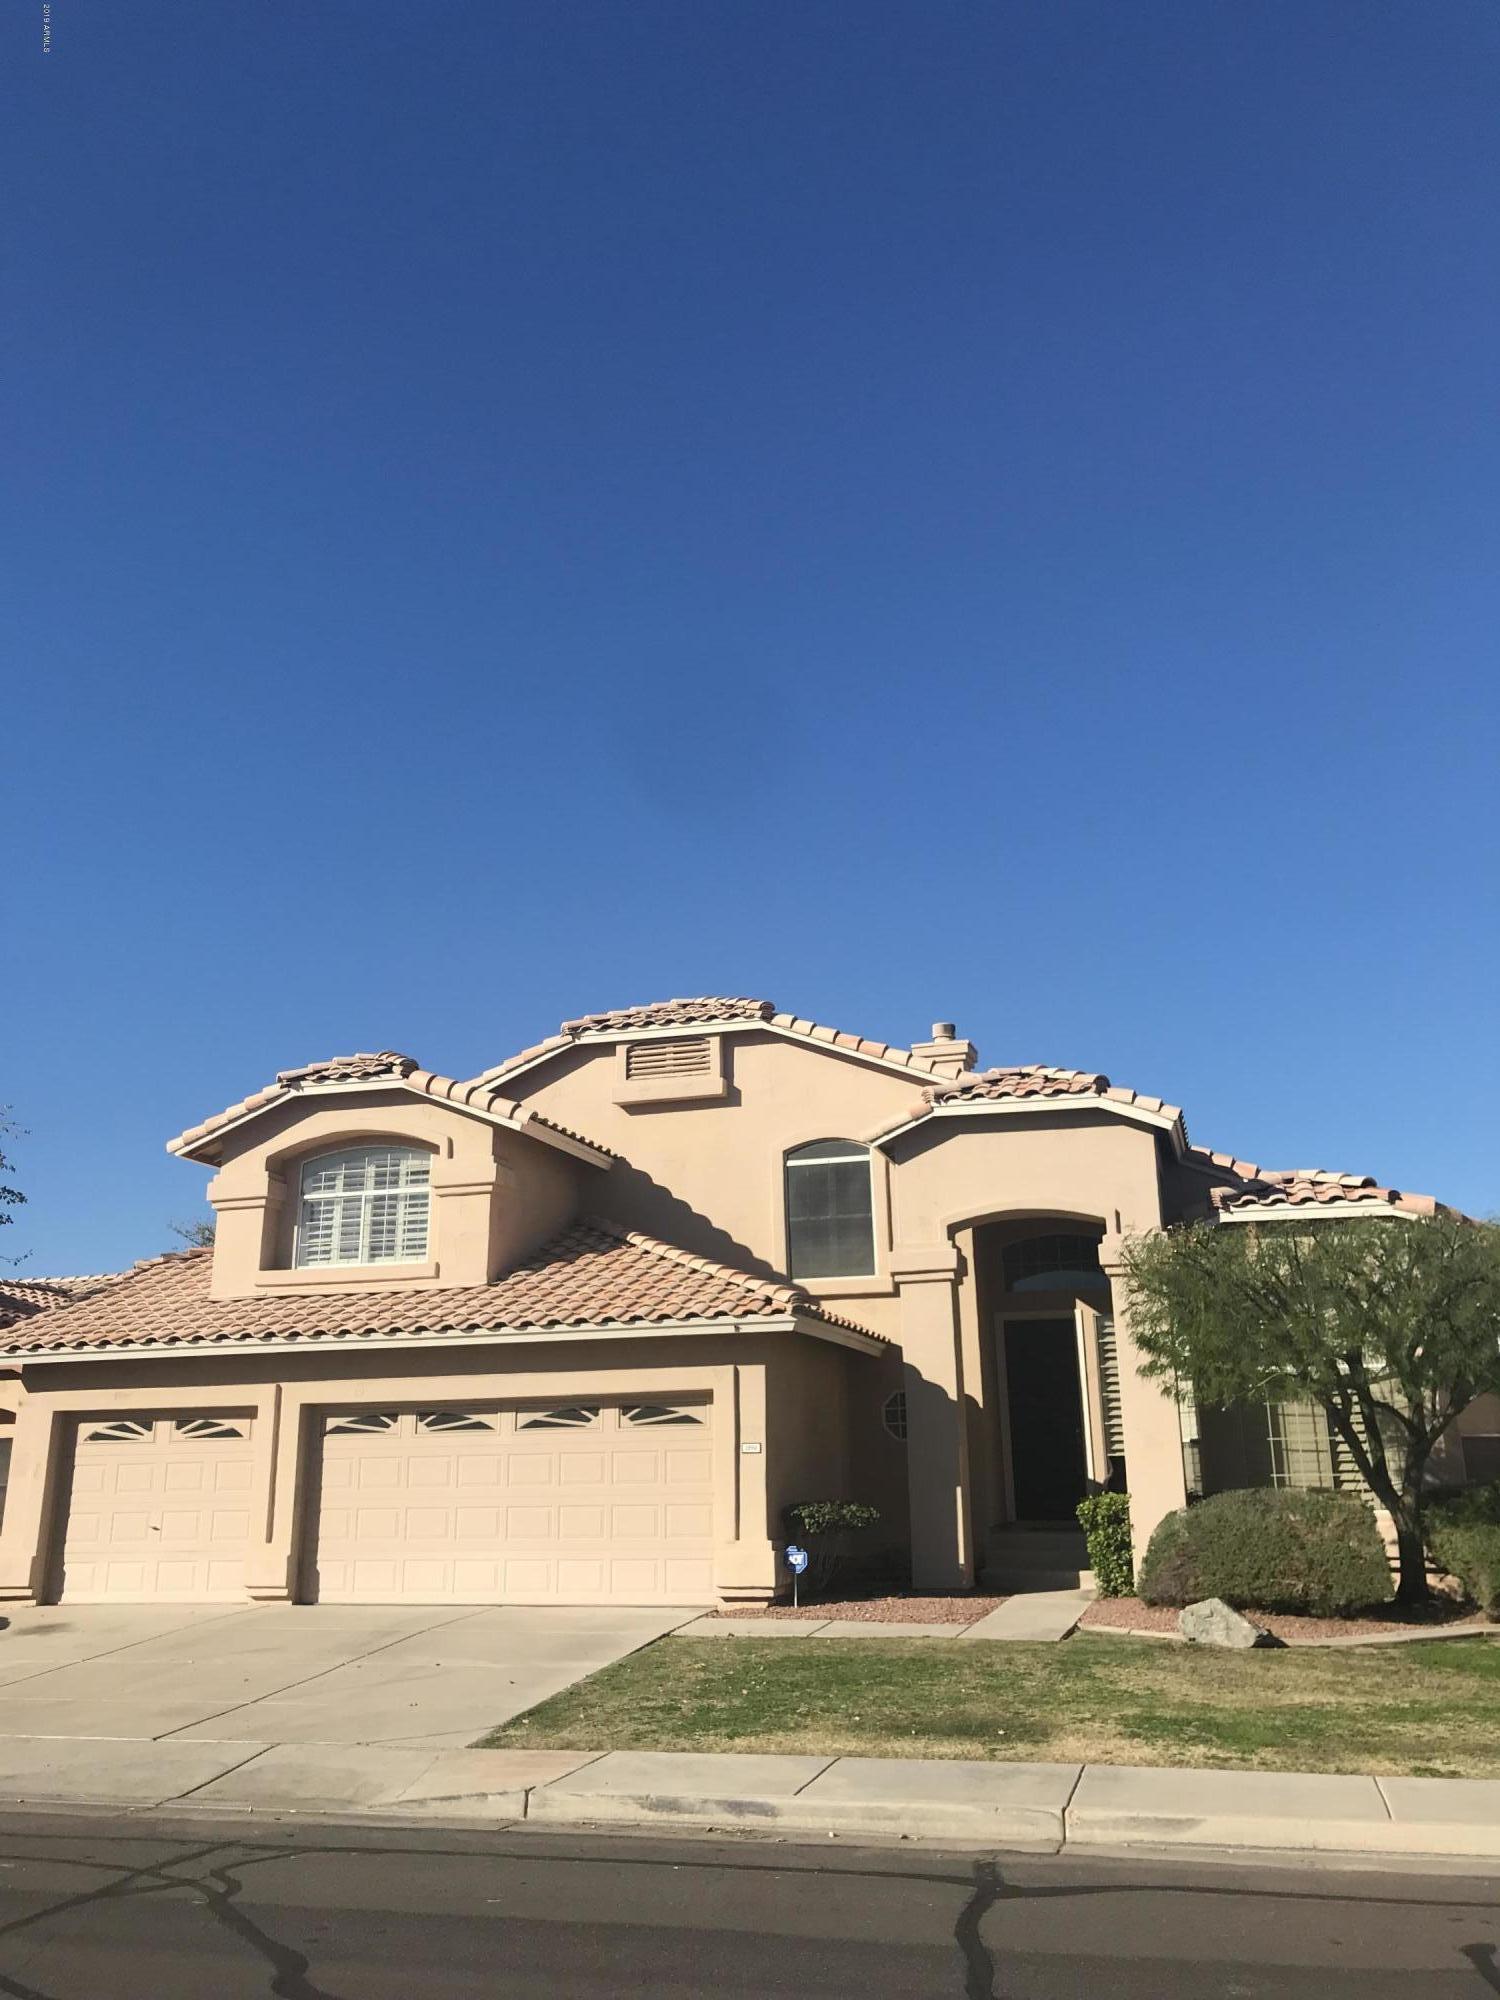 Photo of 1590 S YUCCA Street, Chandler, AZ 85286